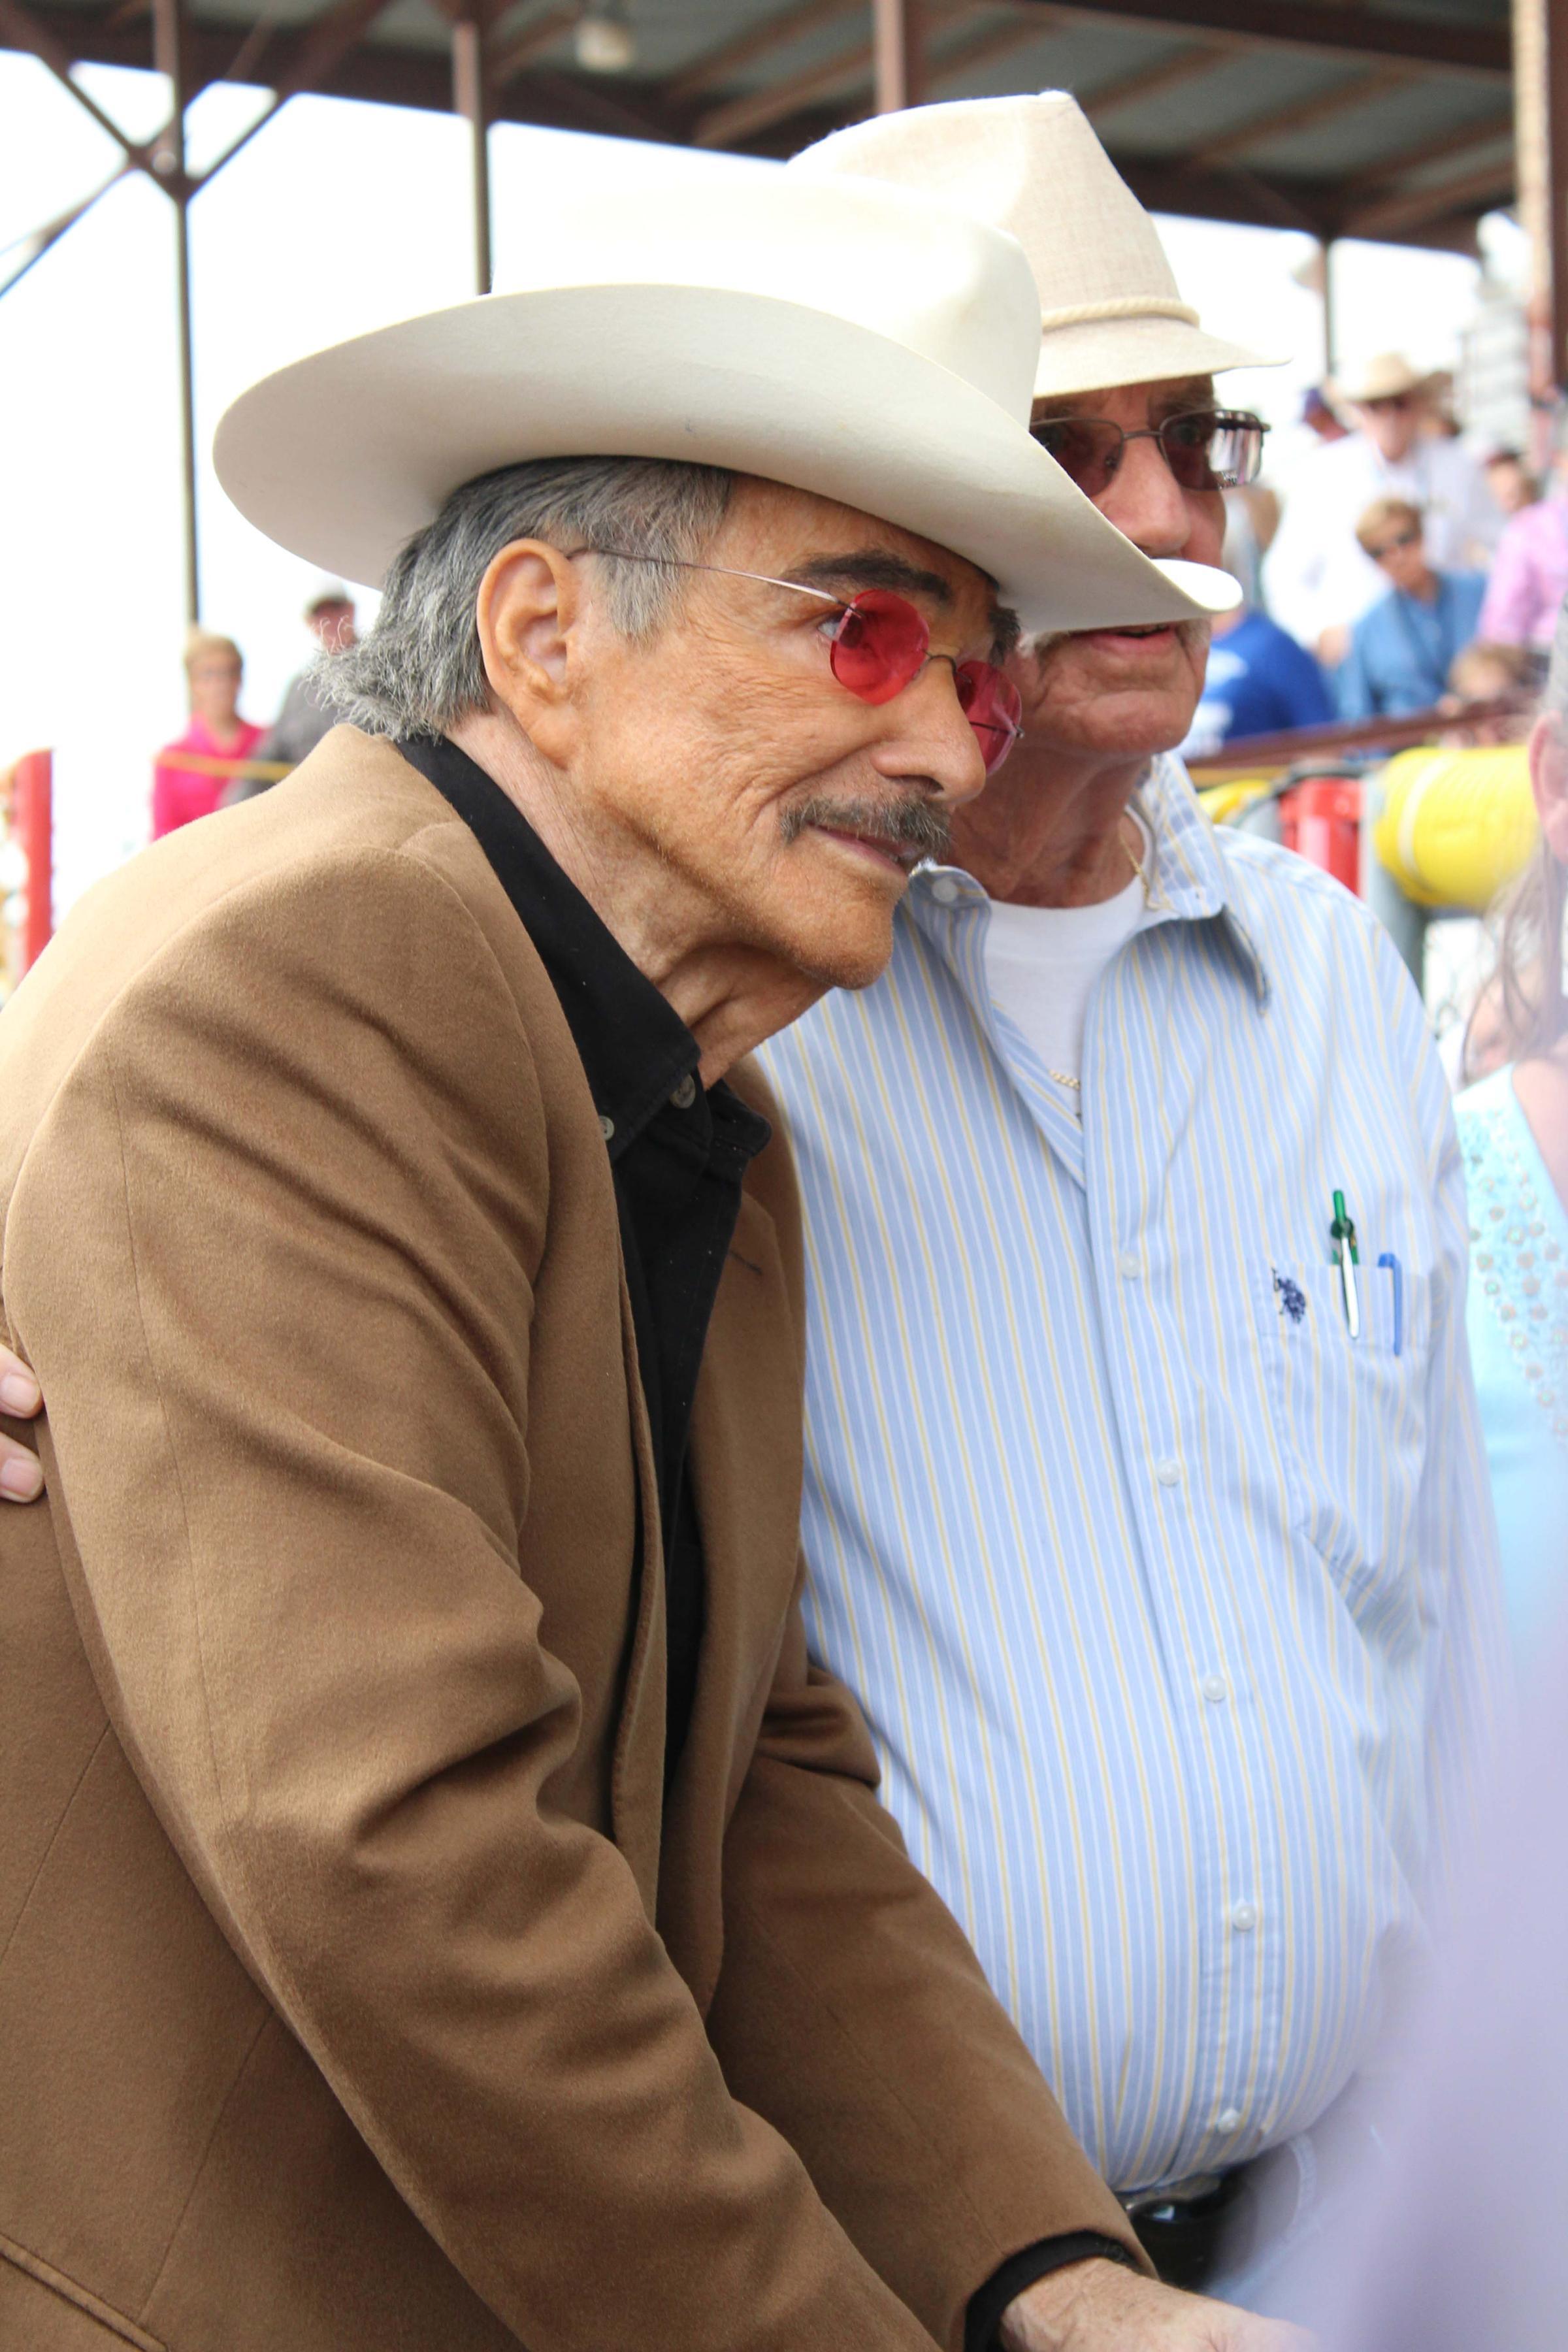 Devoted Fans Flock To Dodge City For Gunsmoke Reunion Kmuw